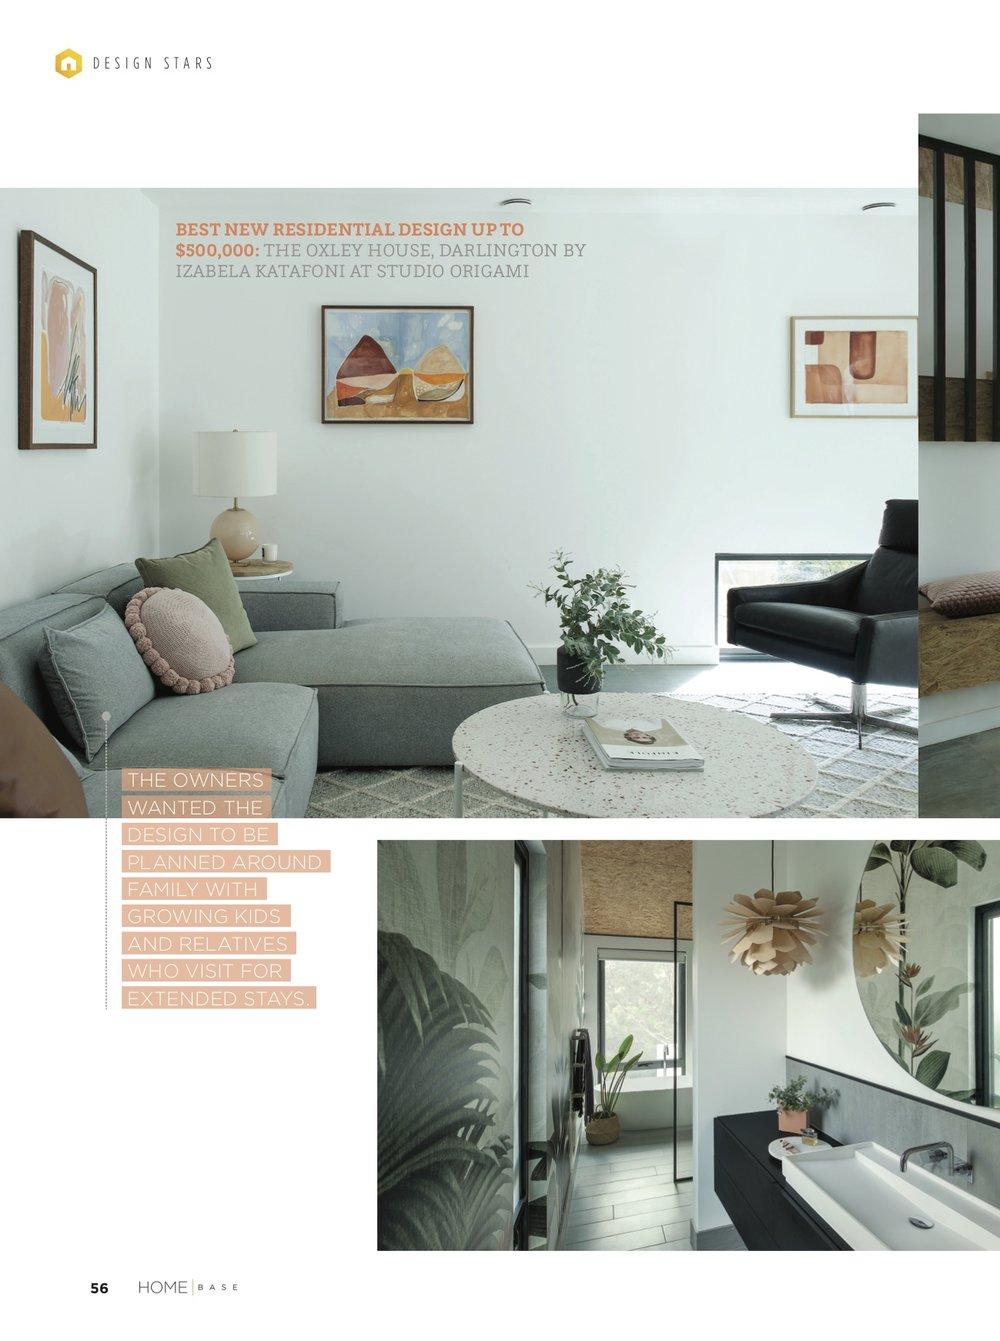 5c3c10b2652ba0d8e665c3c6_05 Design Stars Homes pp46-61 (dragged) 7.jpg